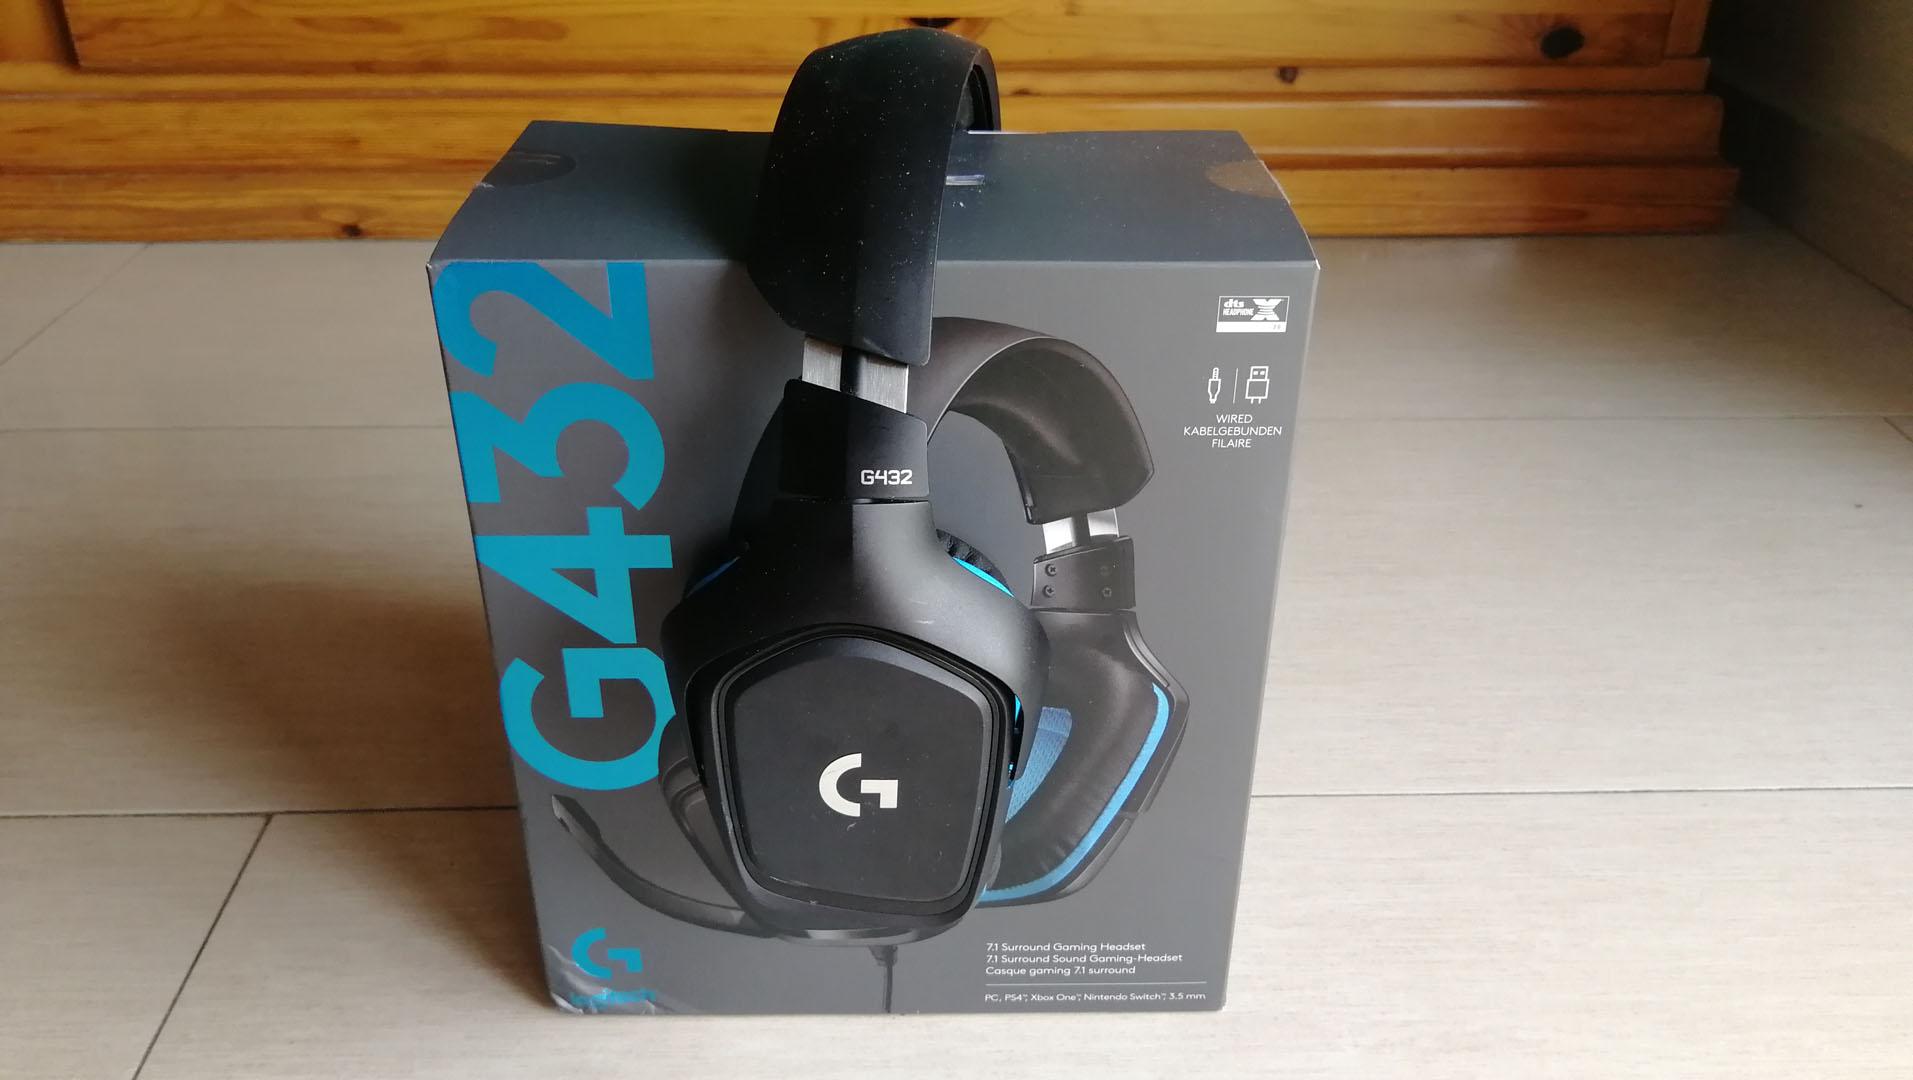 Recensione Logitech G432, headset con Dolby Surround 7.1 2